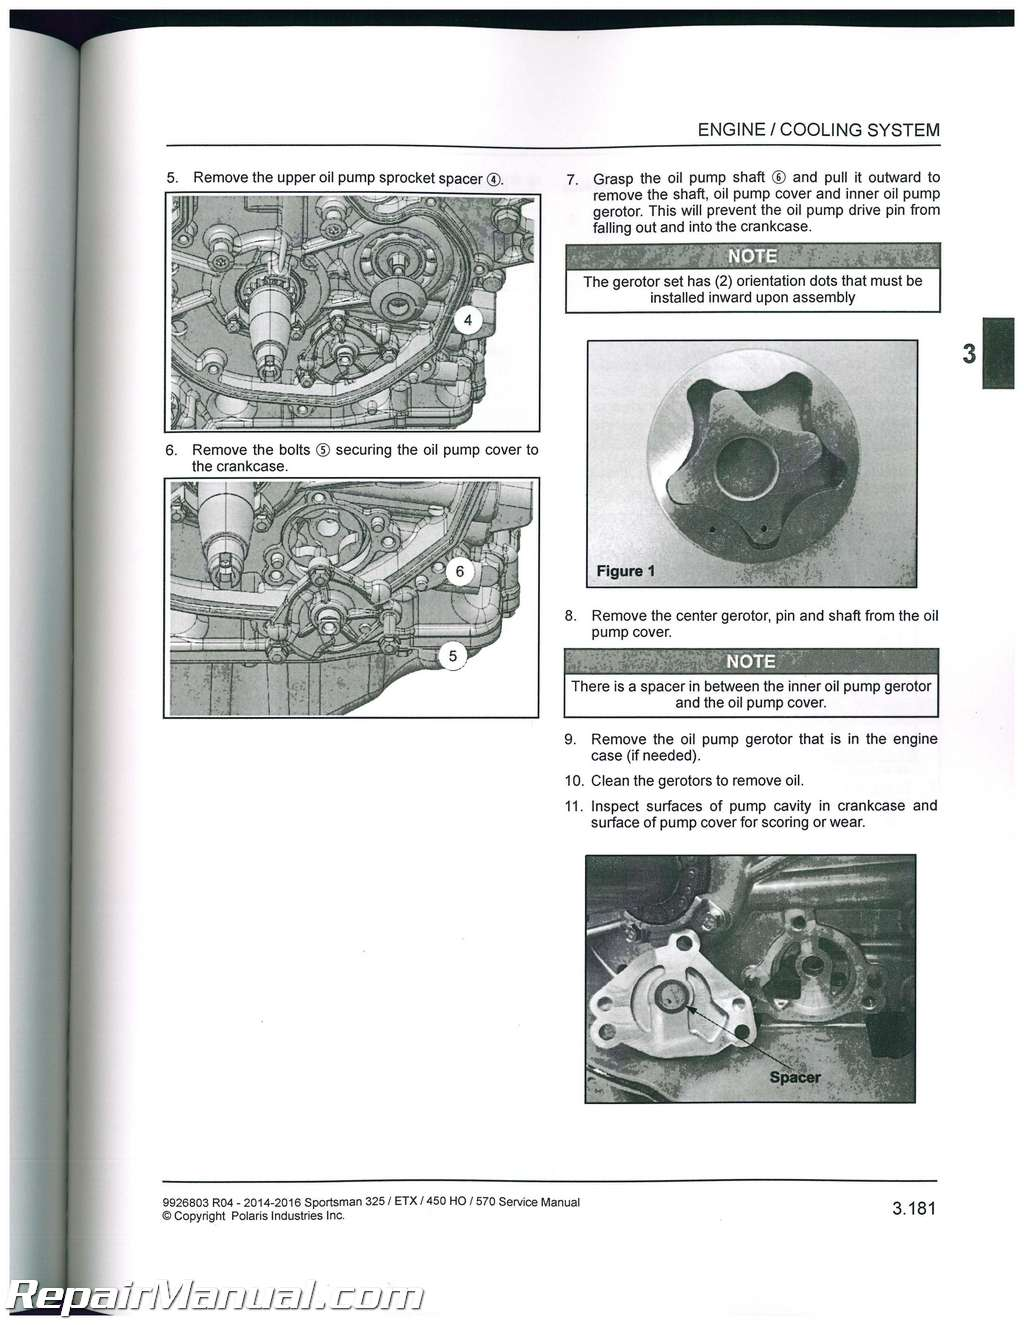 2014 polaris sportsman 400 ho repair manual